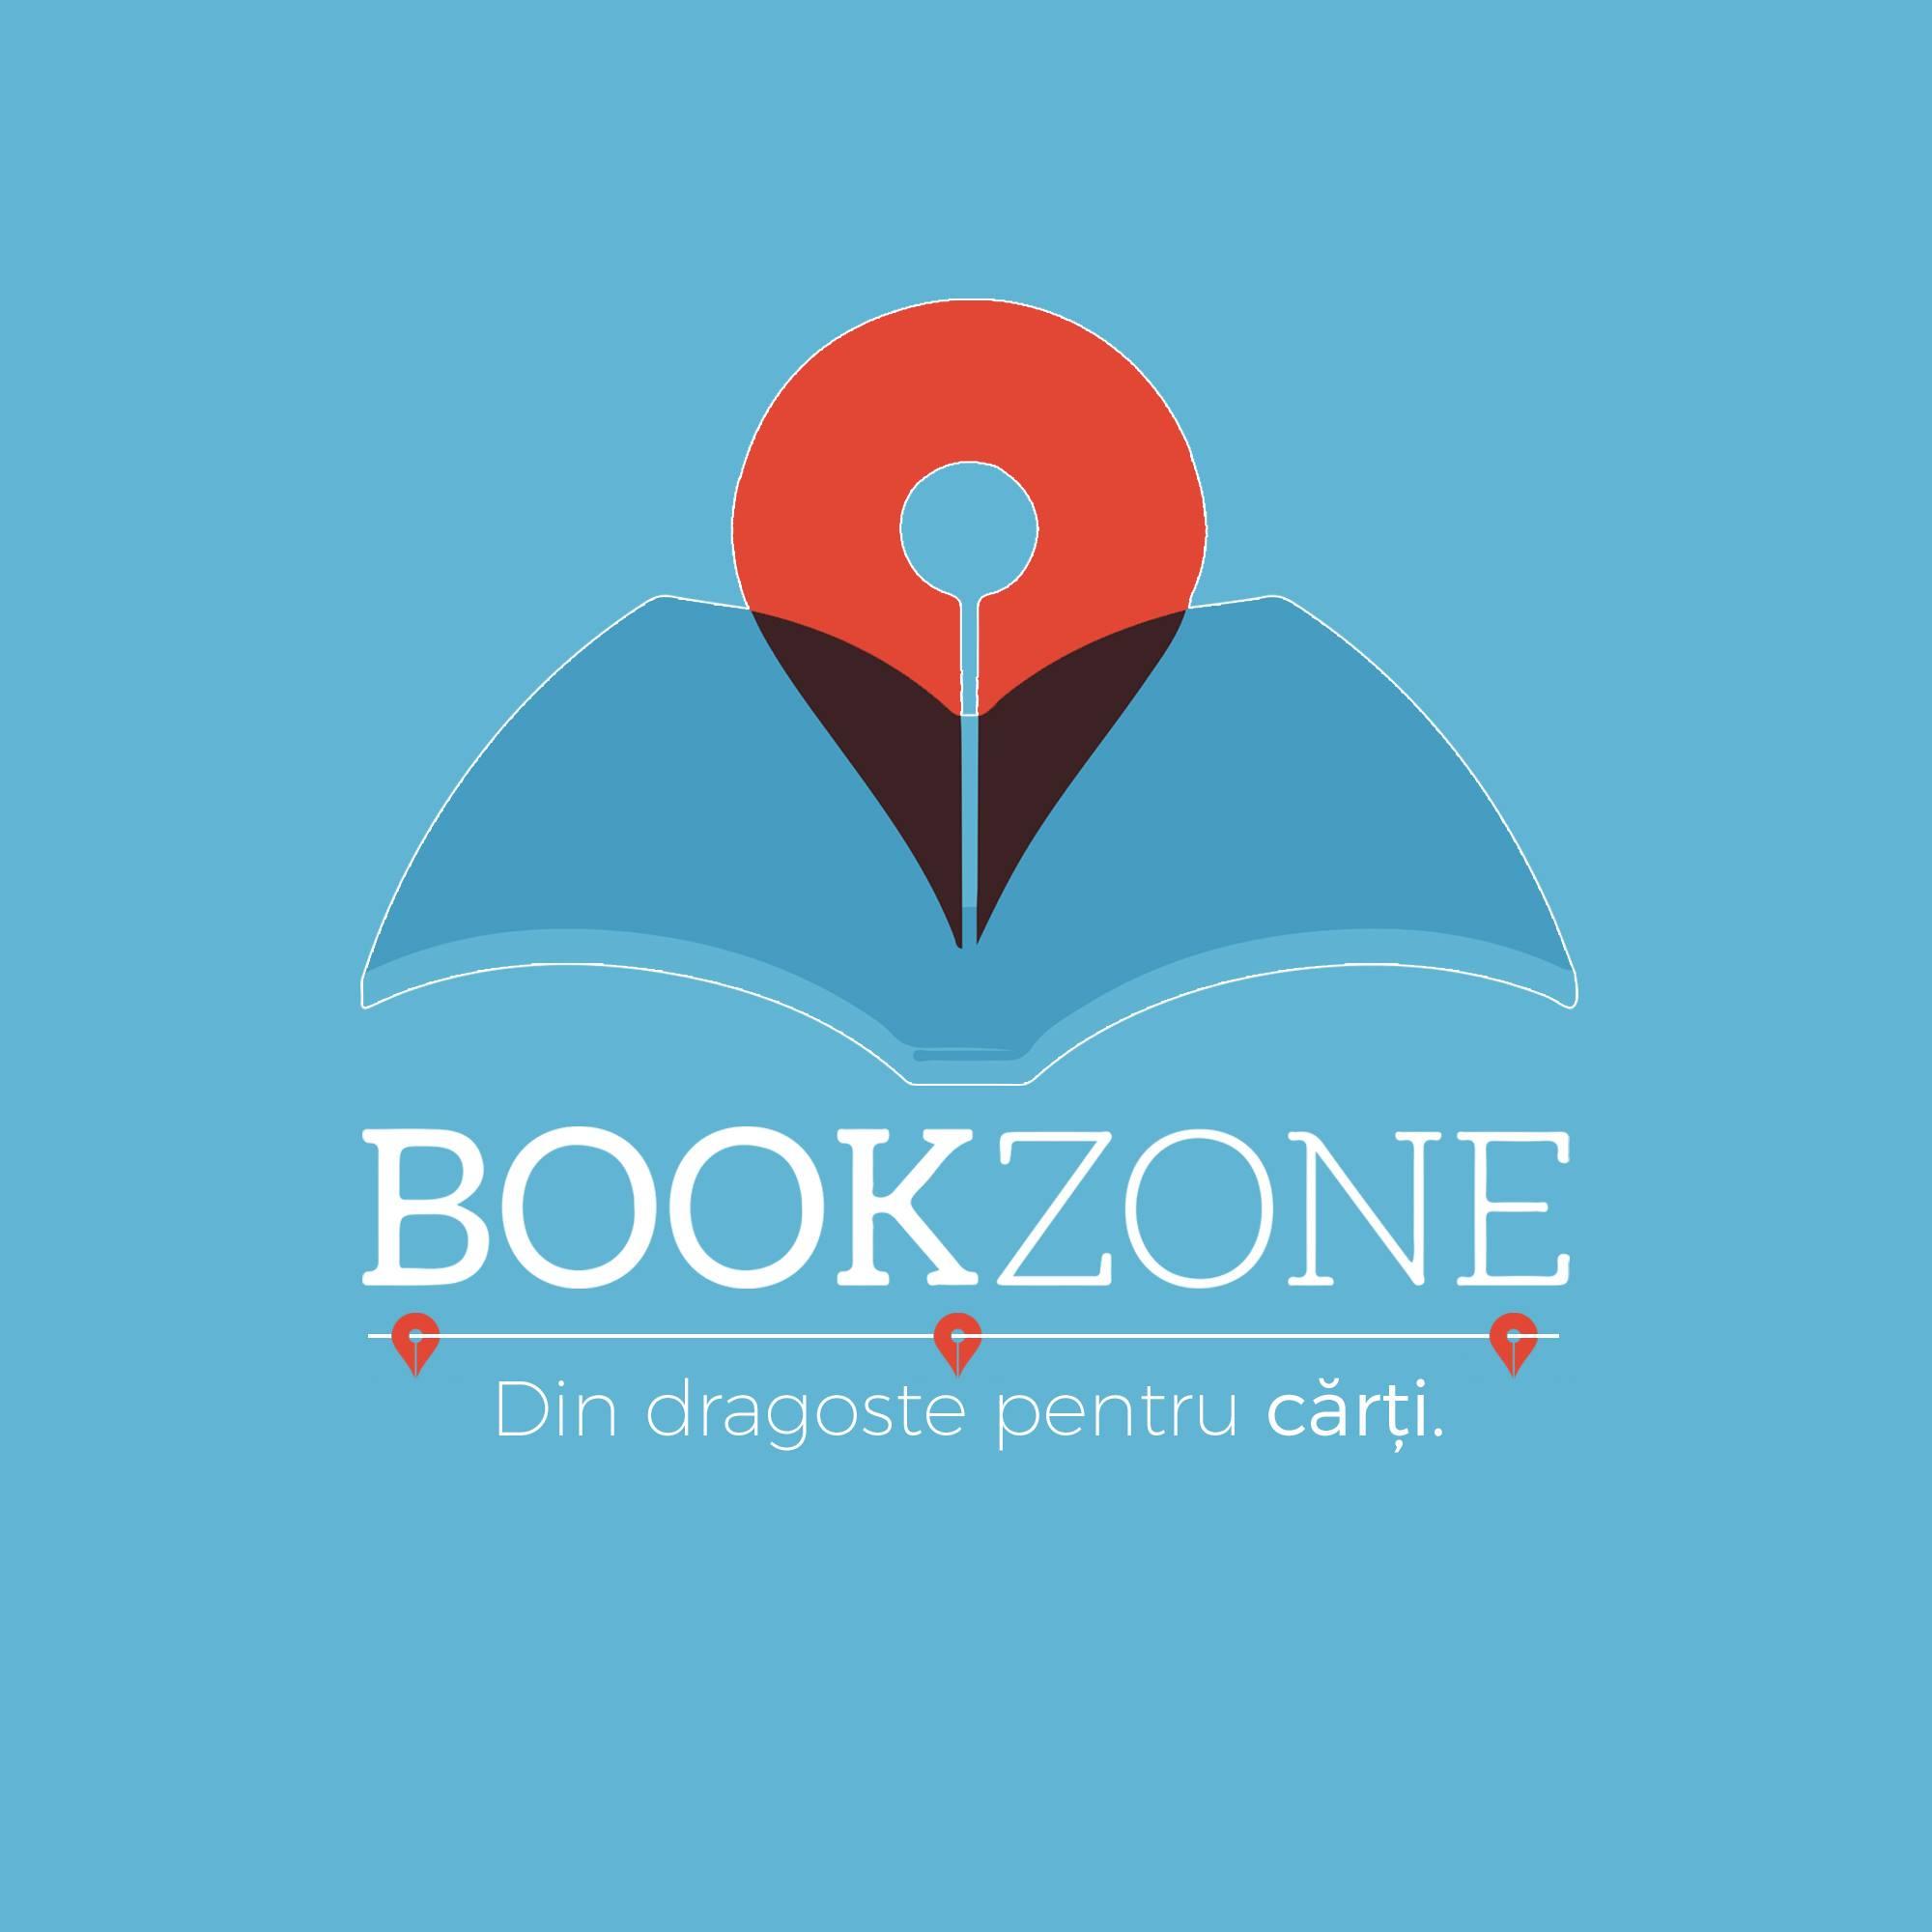 Bookzone